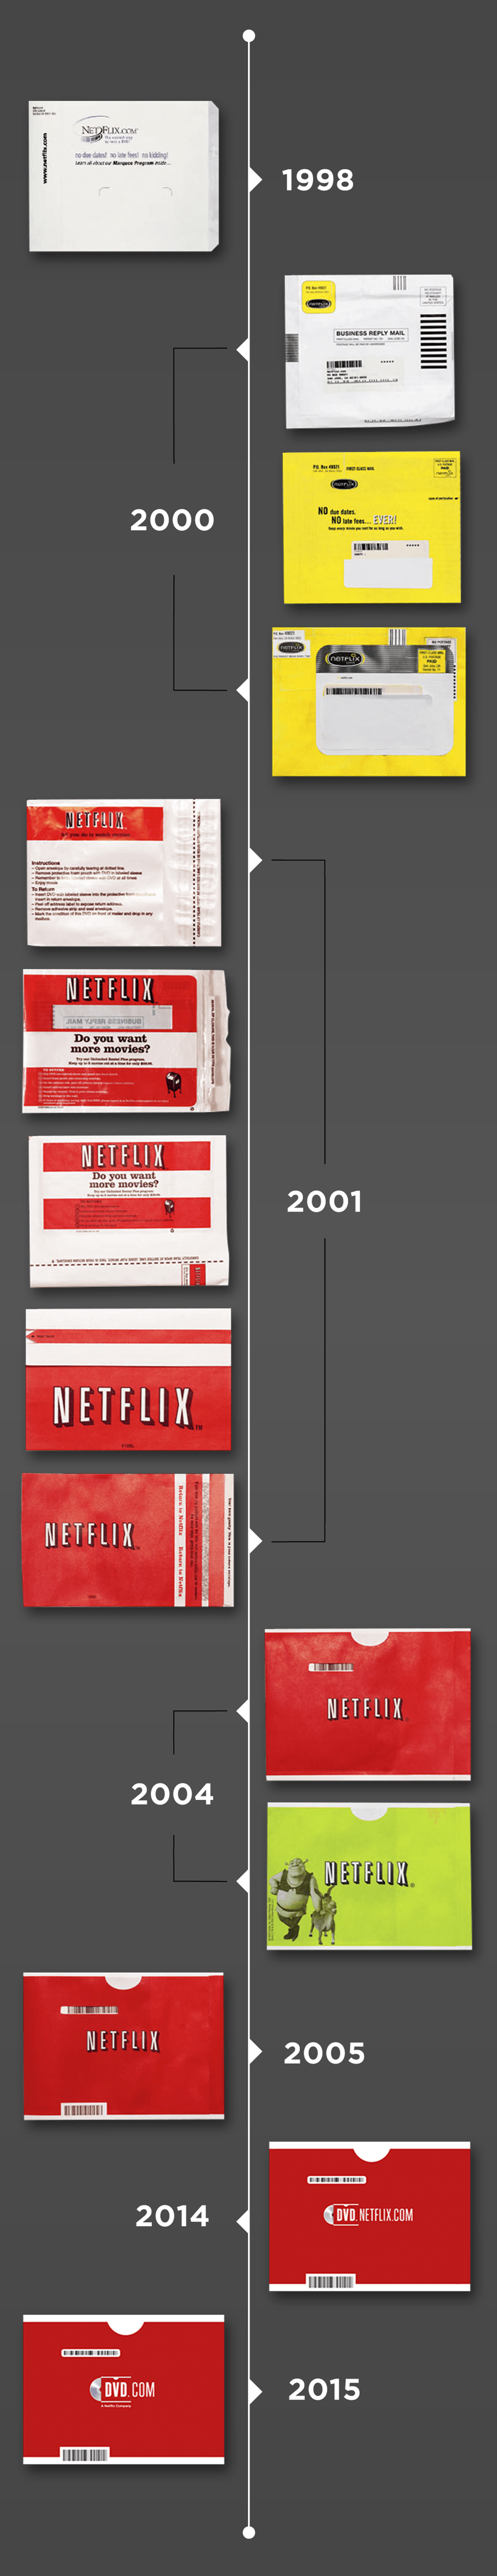 20th Anniversary Mailer Evolution Timeline-sm.png